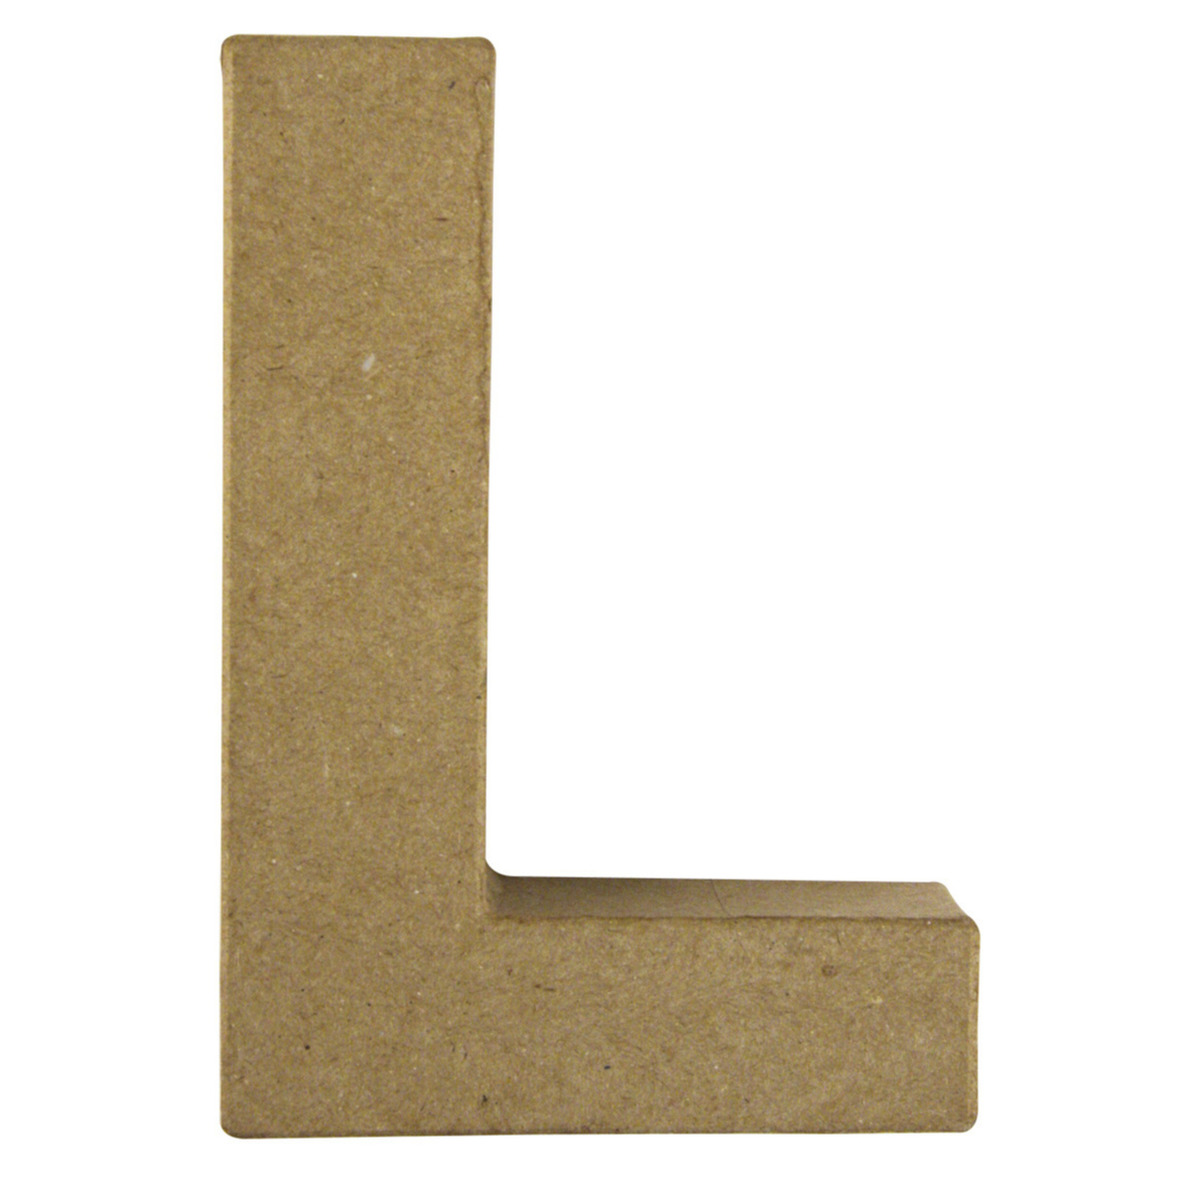 Letter L van papier mache onbeschilderd